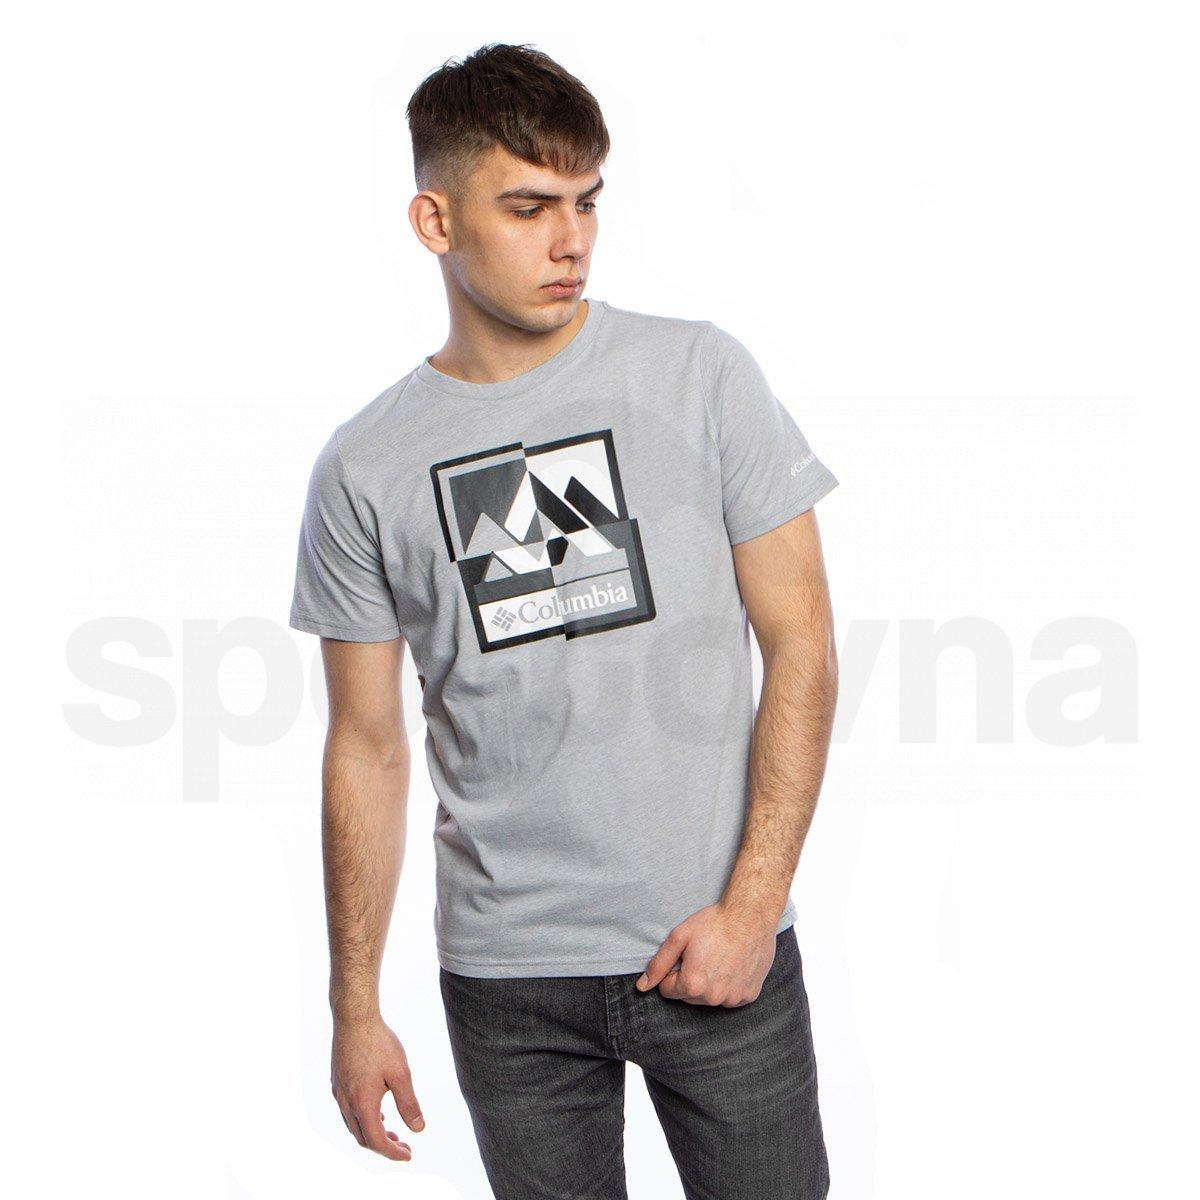 eng_pl_T-shirt-Columbia-M-Alpine-Way-Graphic-Tee-grey-44633_1